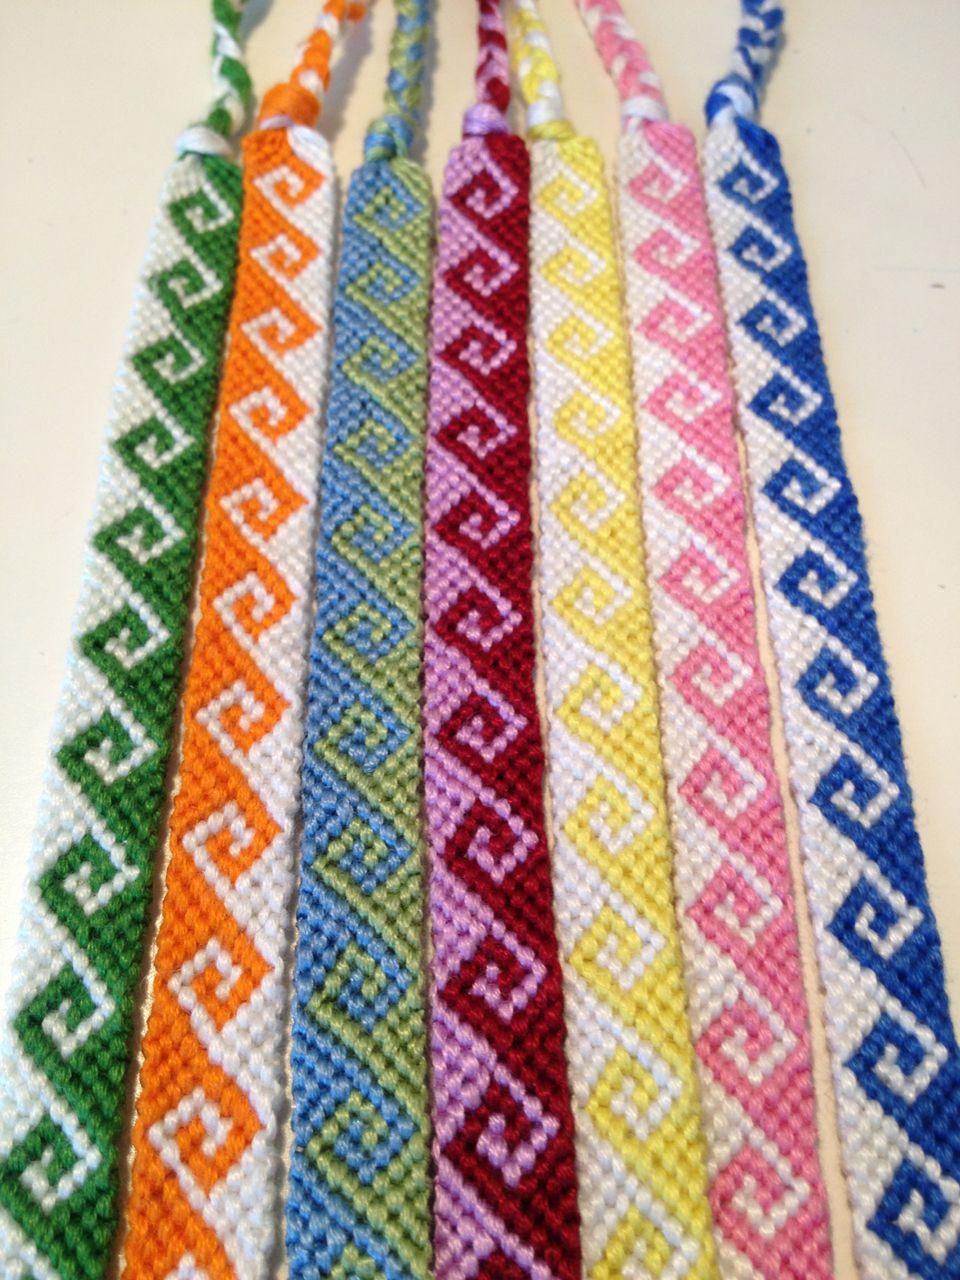 Spiral Friendship Bracelet Pattern Number 8534  For More Patterns And  Tutorials Visit Our Web Or